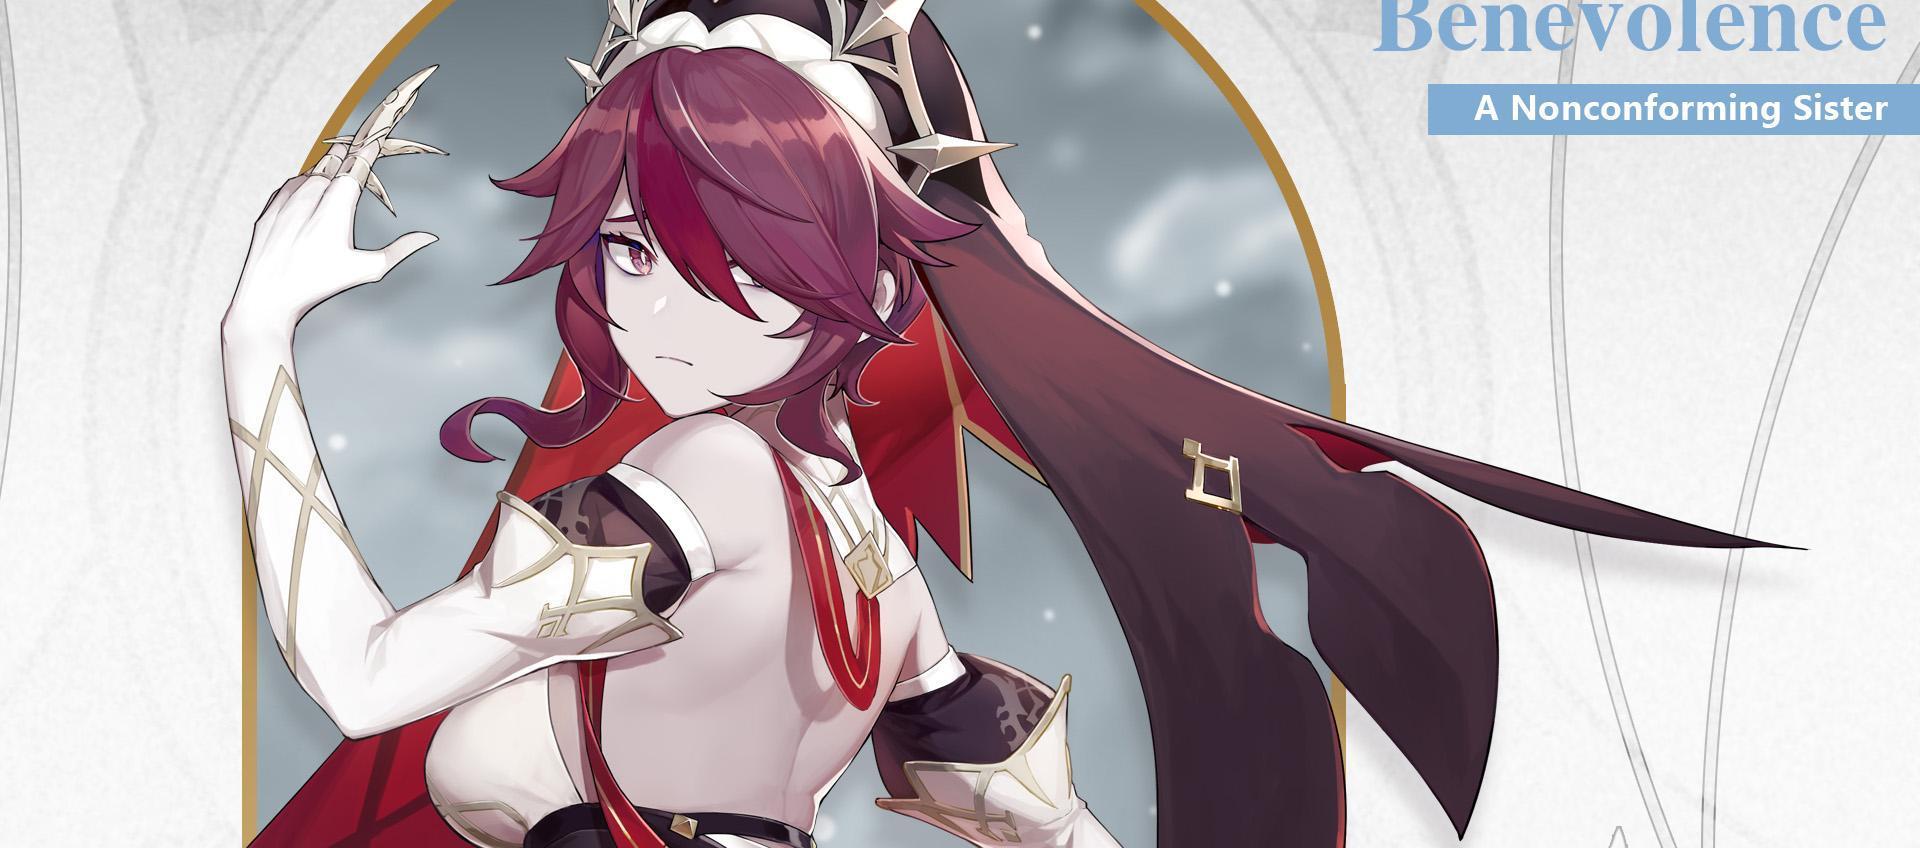 Genshin Impact A Rosaria Build Guaranteed to be the Last Thing ...